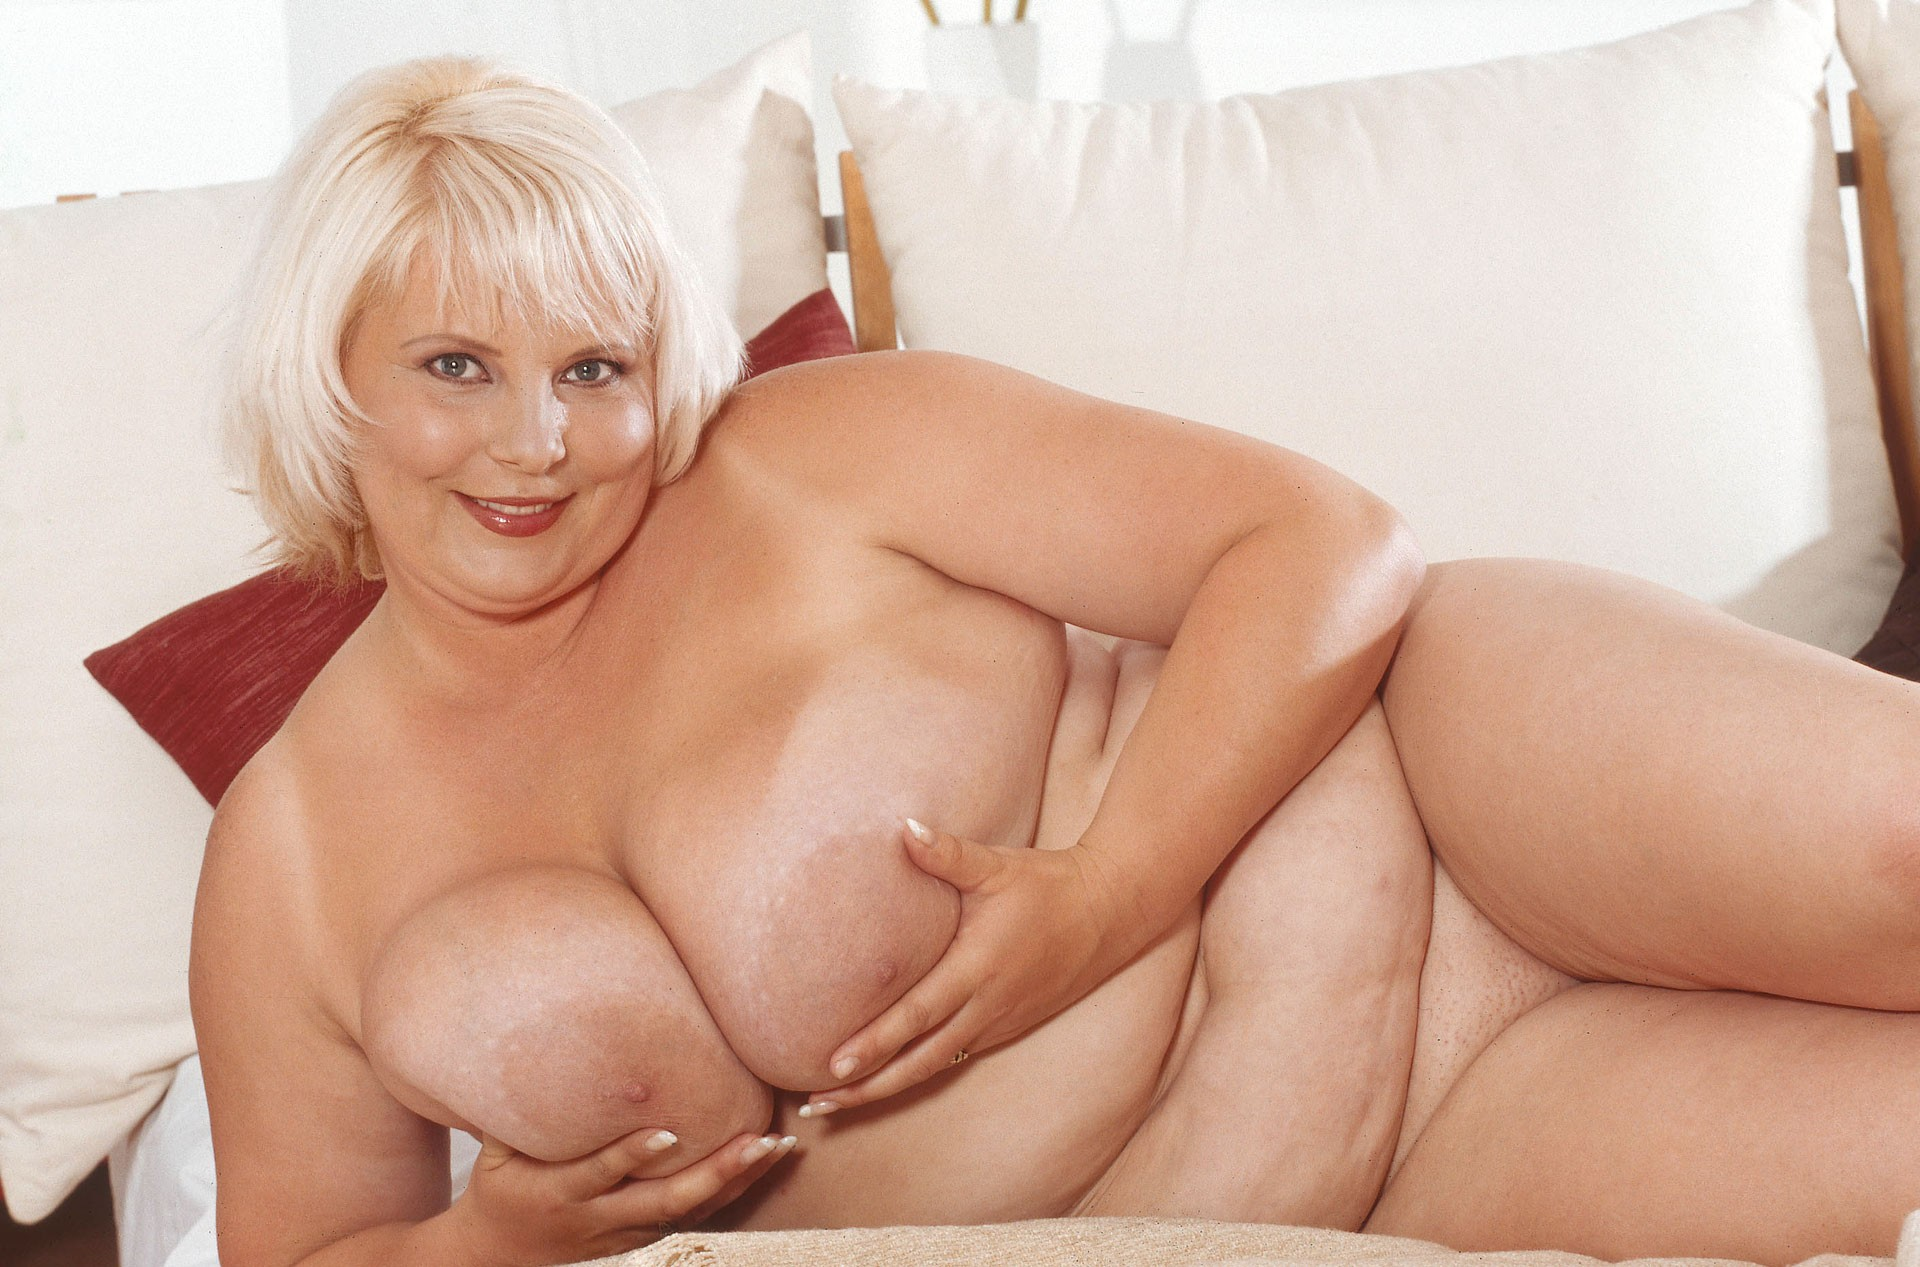 Hot sex of pauli dam indian sexual hot moviemp4 7